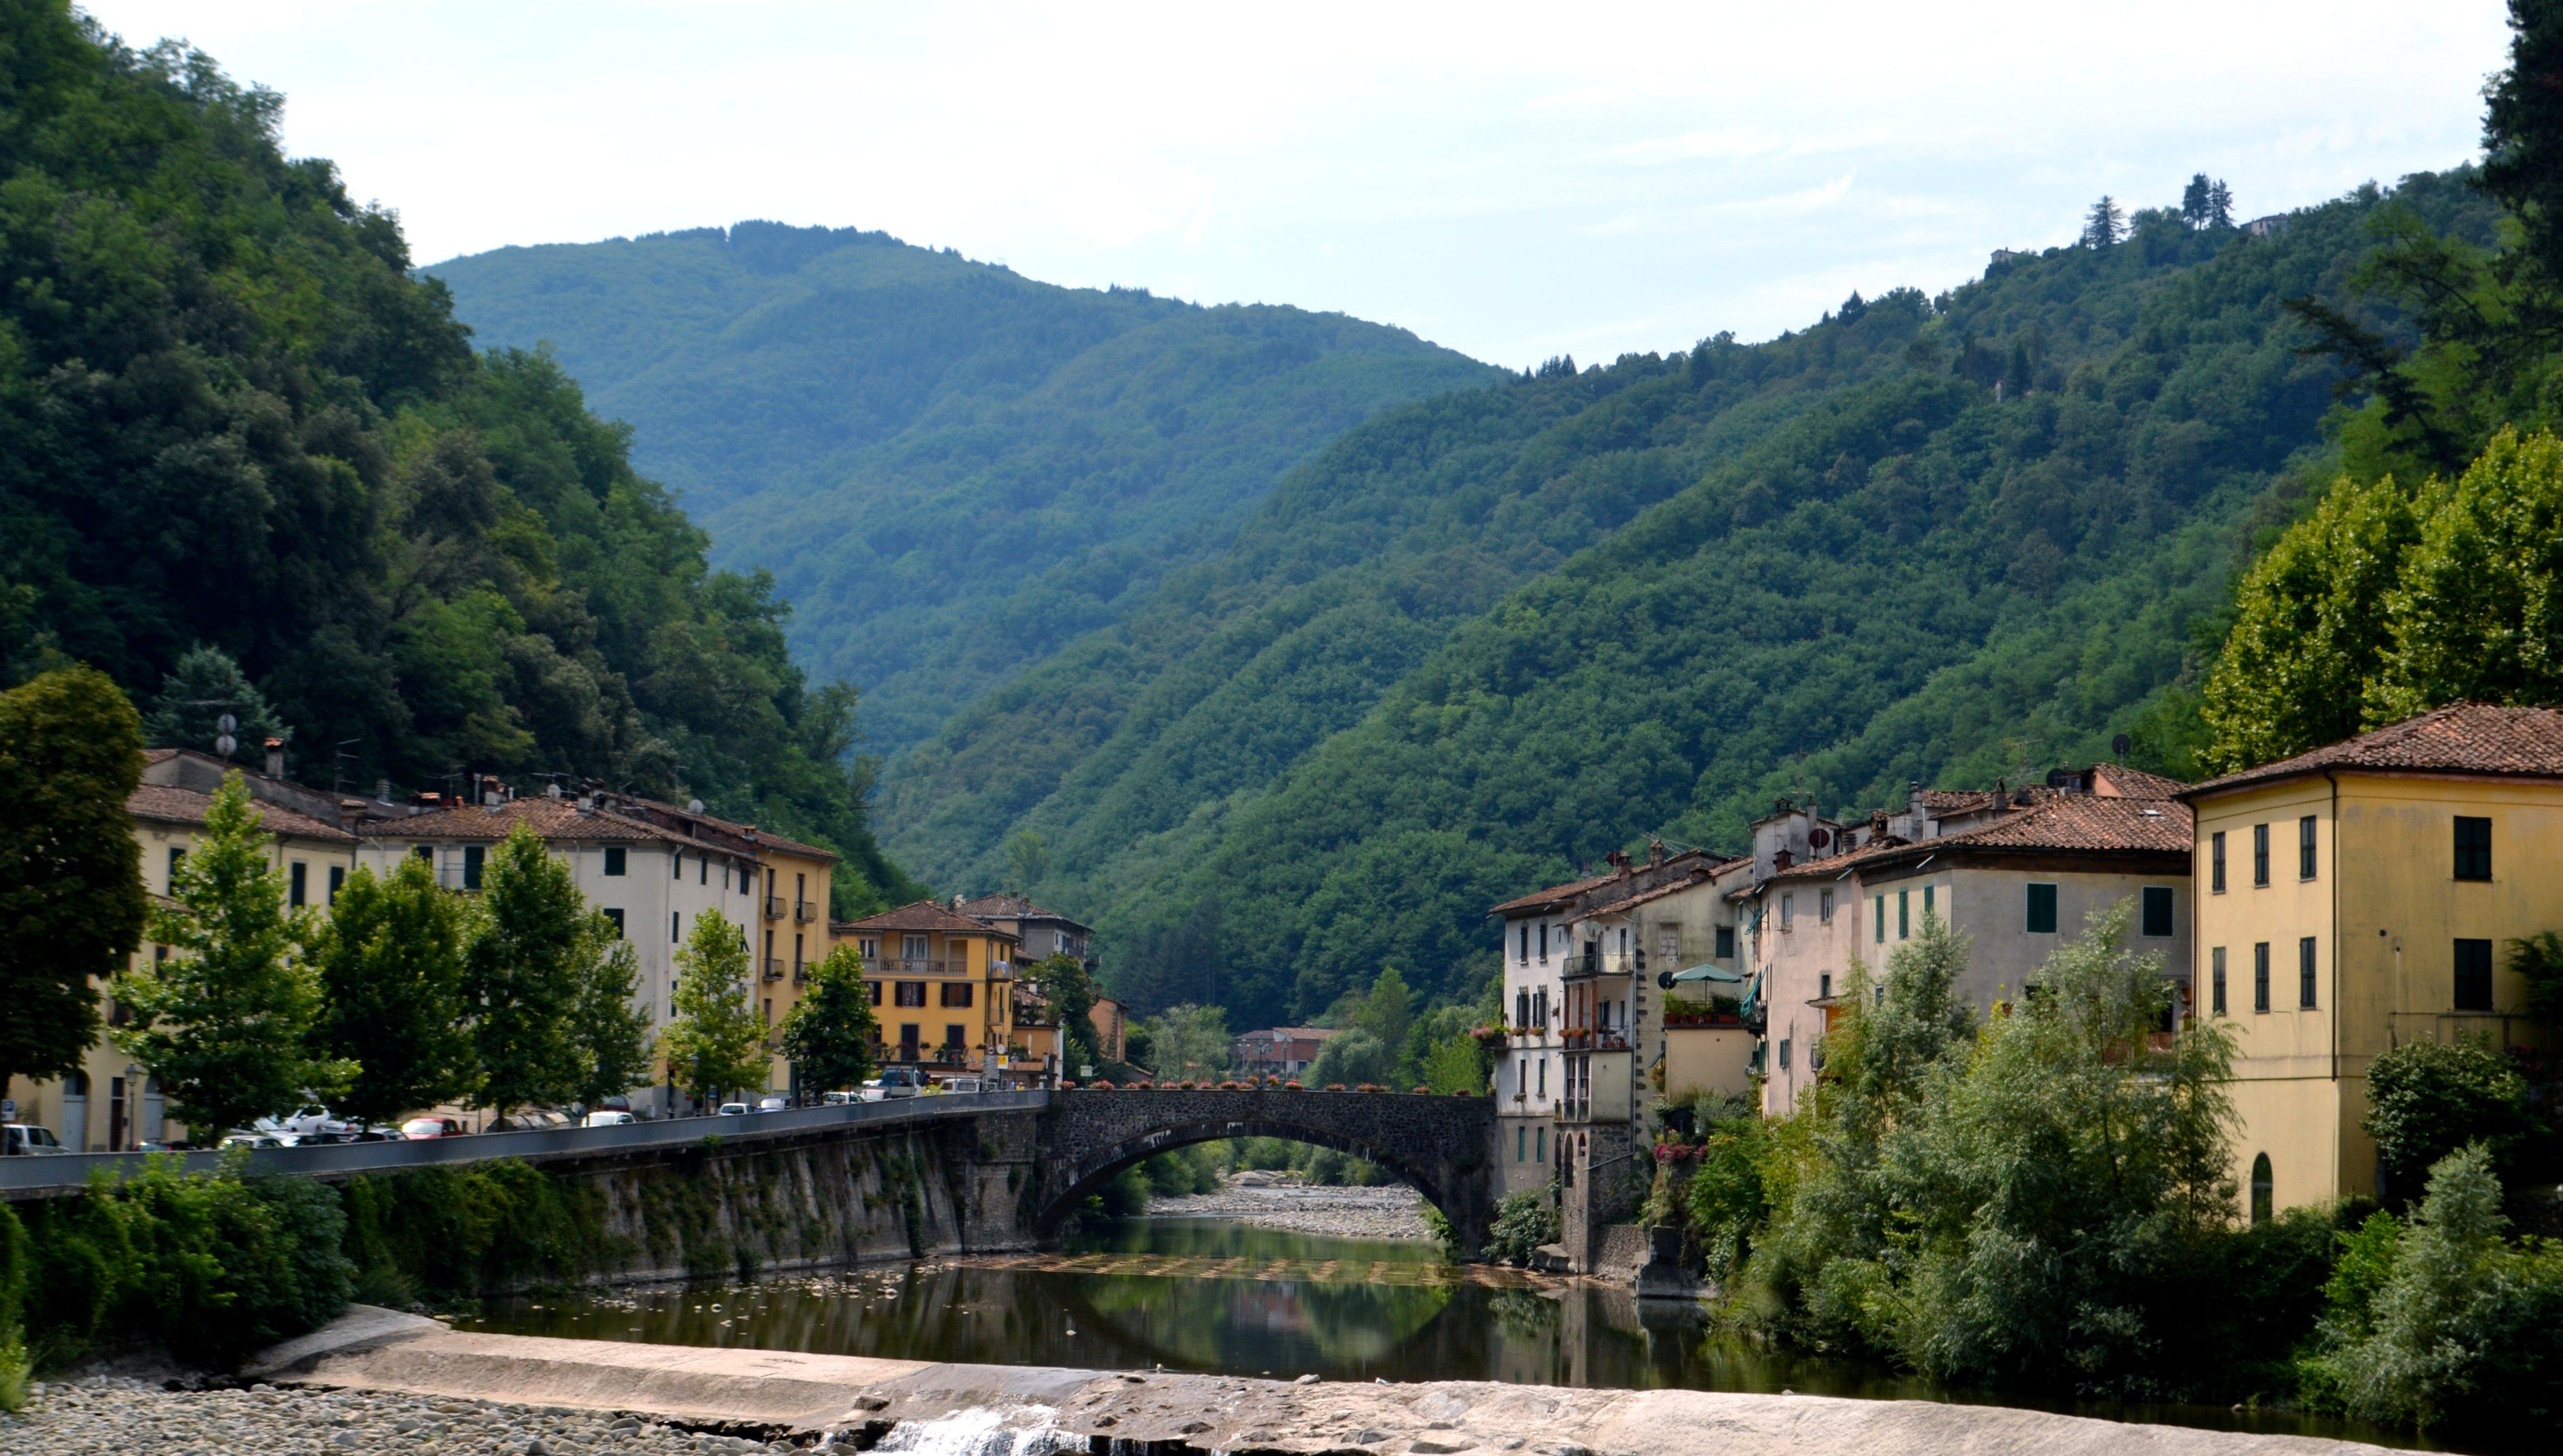 Bagni di Lucca | swfifieldblog